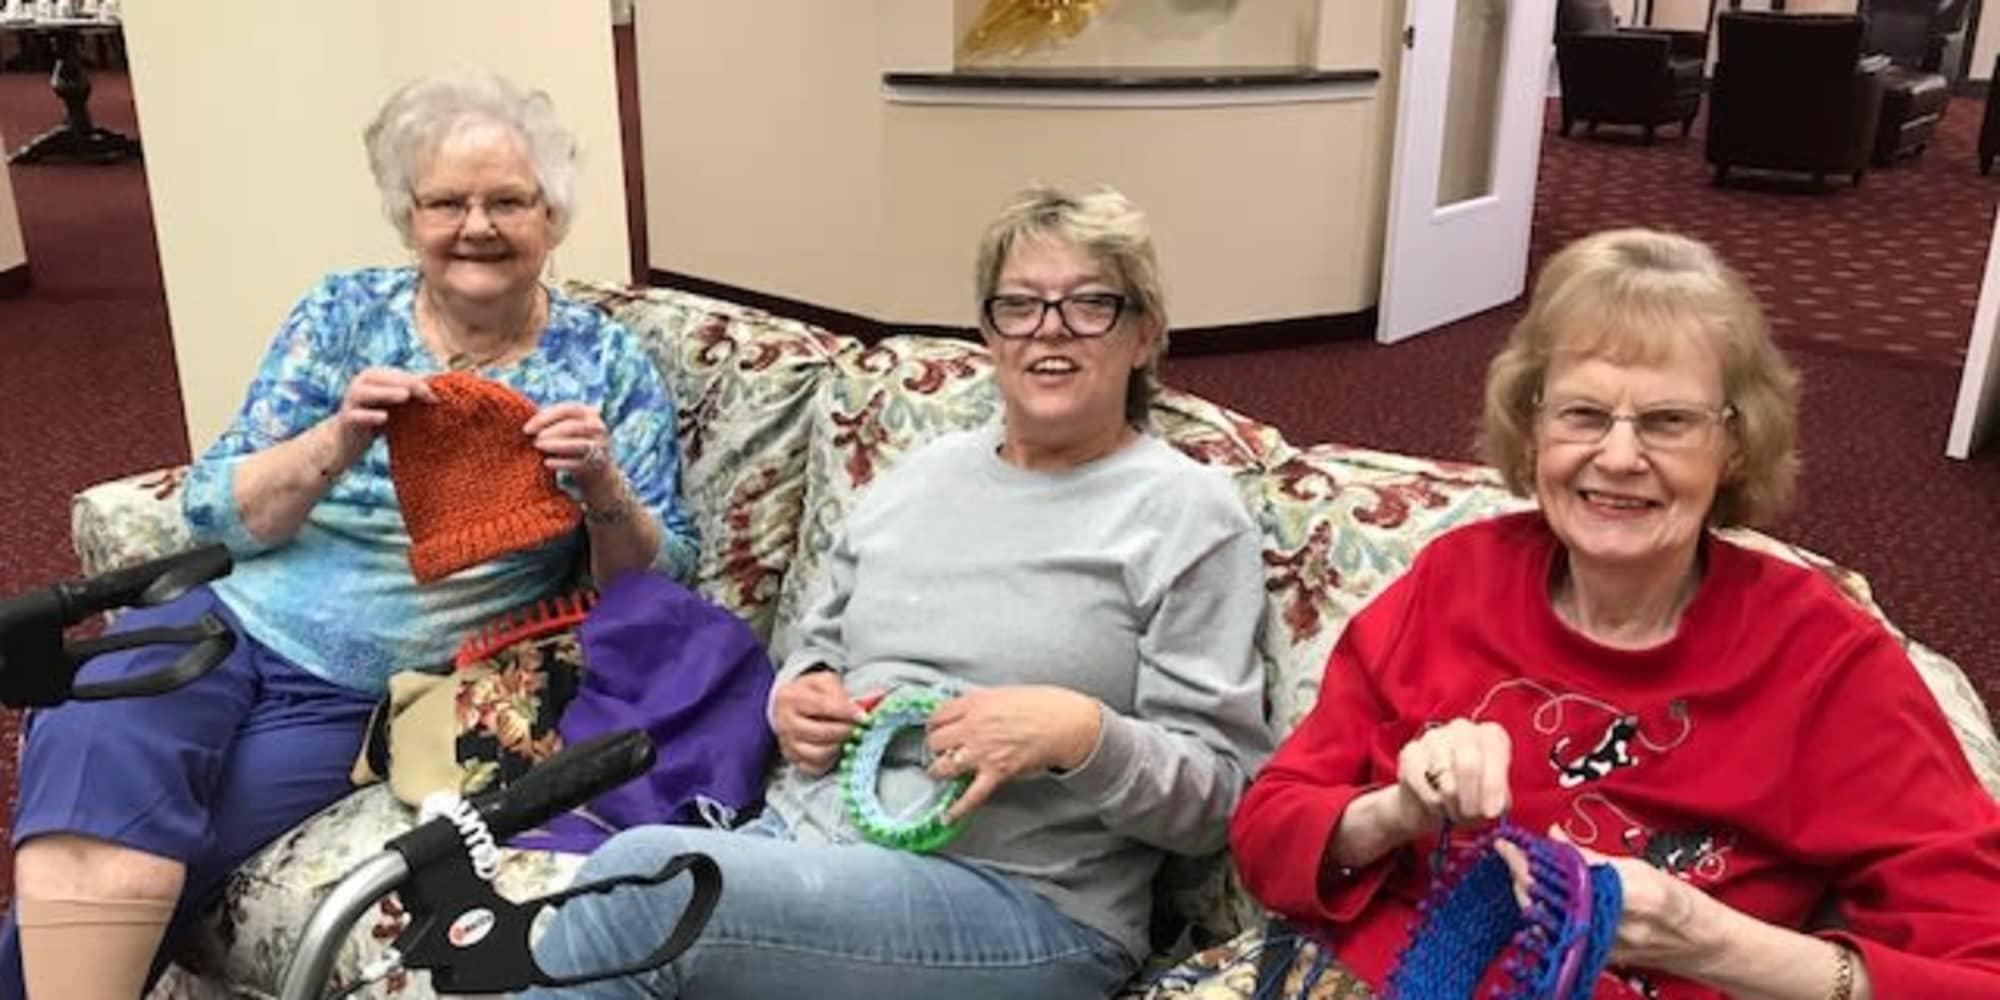 Three residents knitting hats at Meadowlark Estates Gracious Retirement Living in Lawrence, Kansas